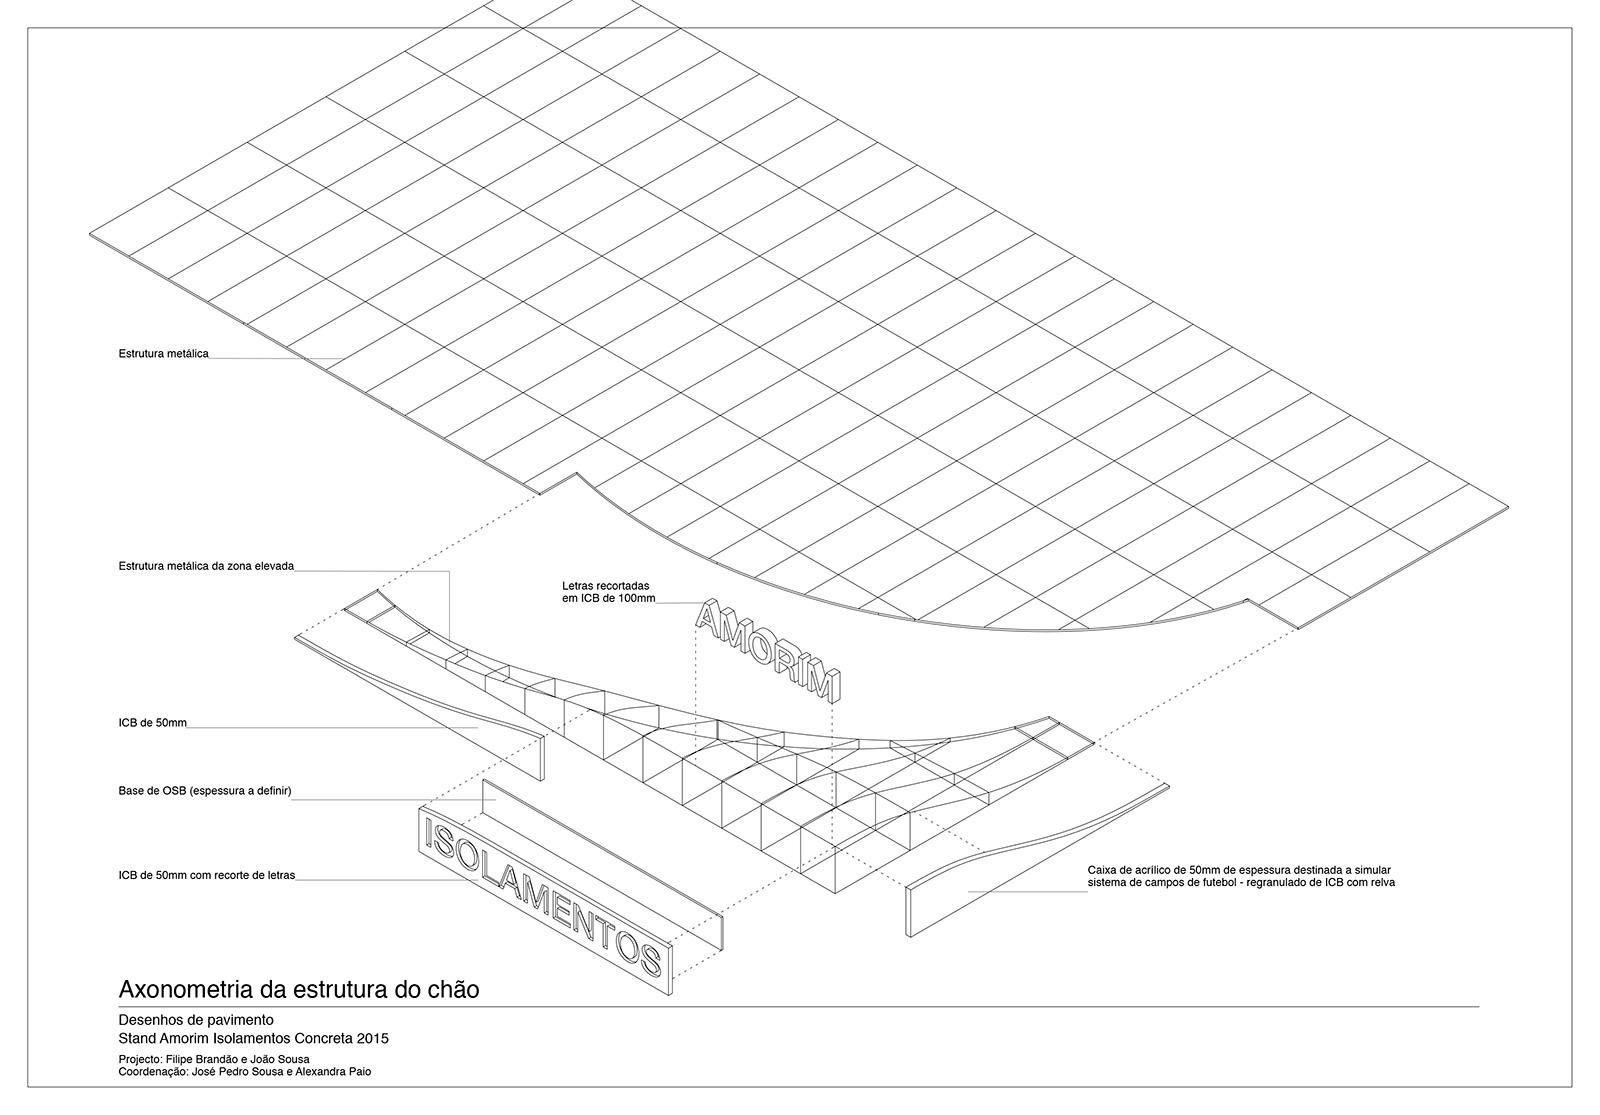 exploded axon diagram 1998 ford mustang ac wiring cork shell pavilion filipe js brandão